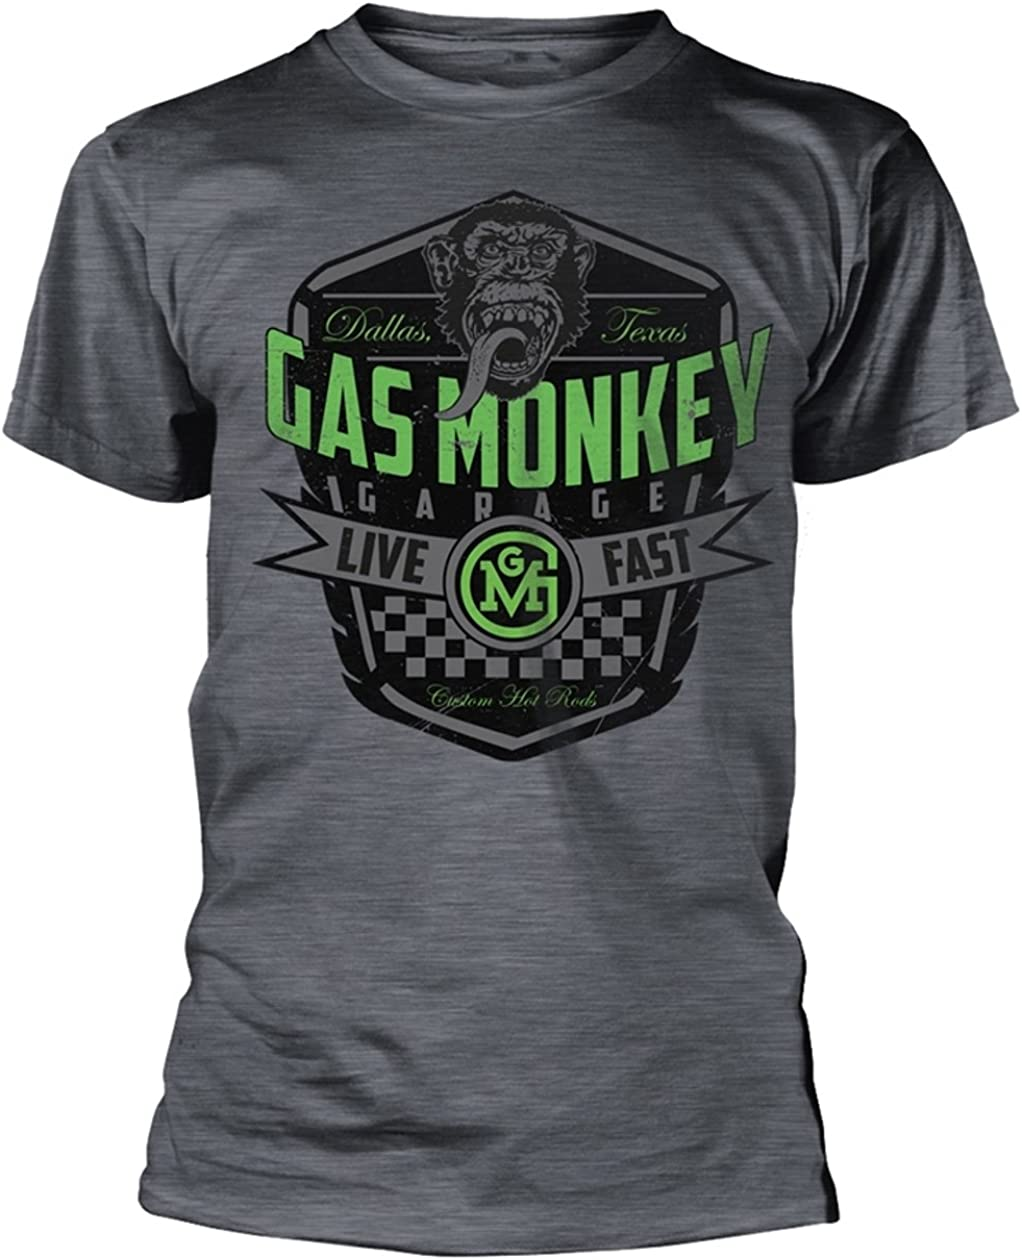 Gas Monkey Garage Live Fast (Gris) Camiseta: Amazon.es: Ropa y ...